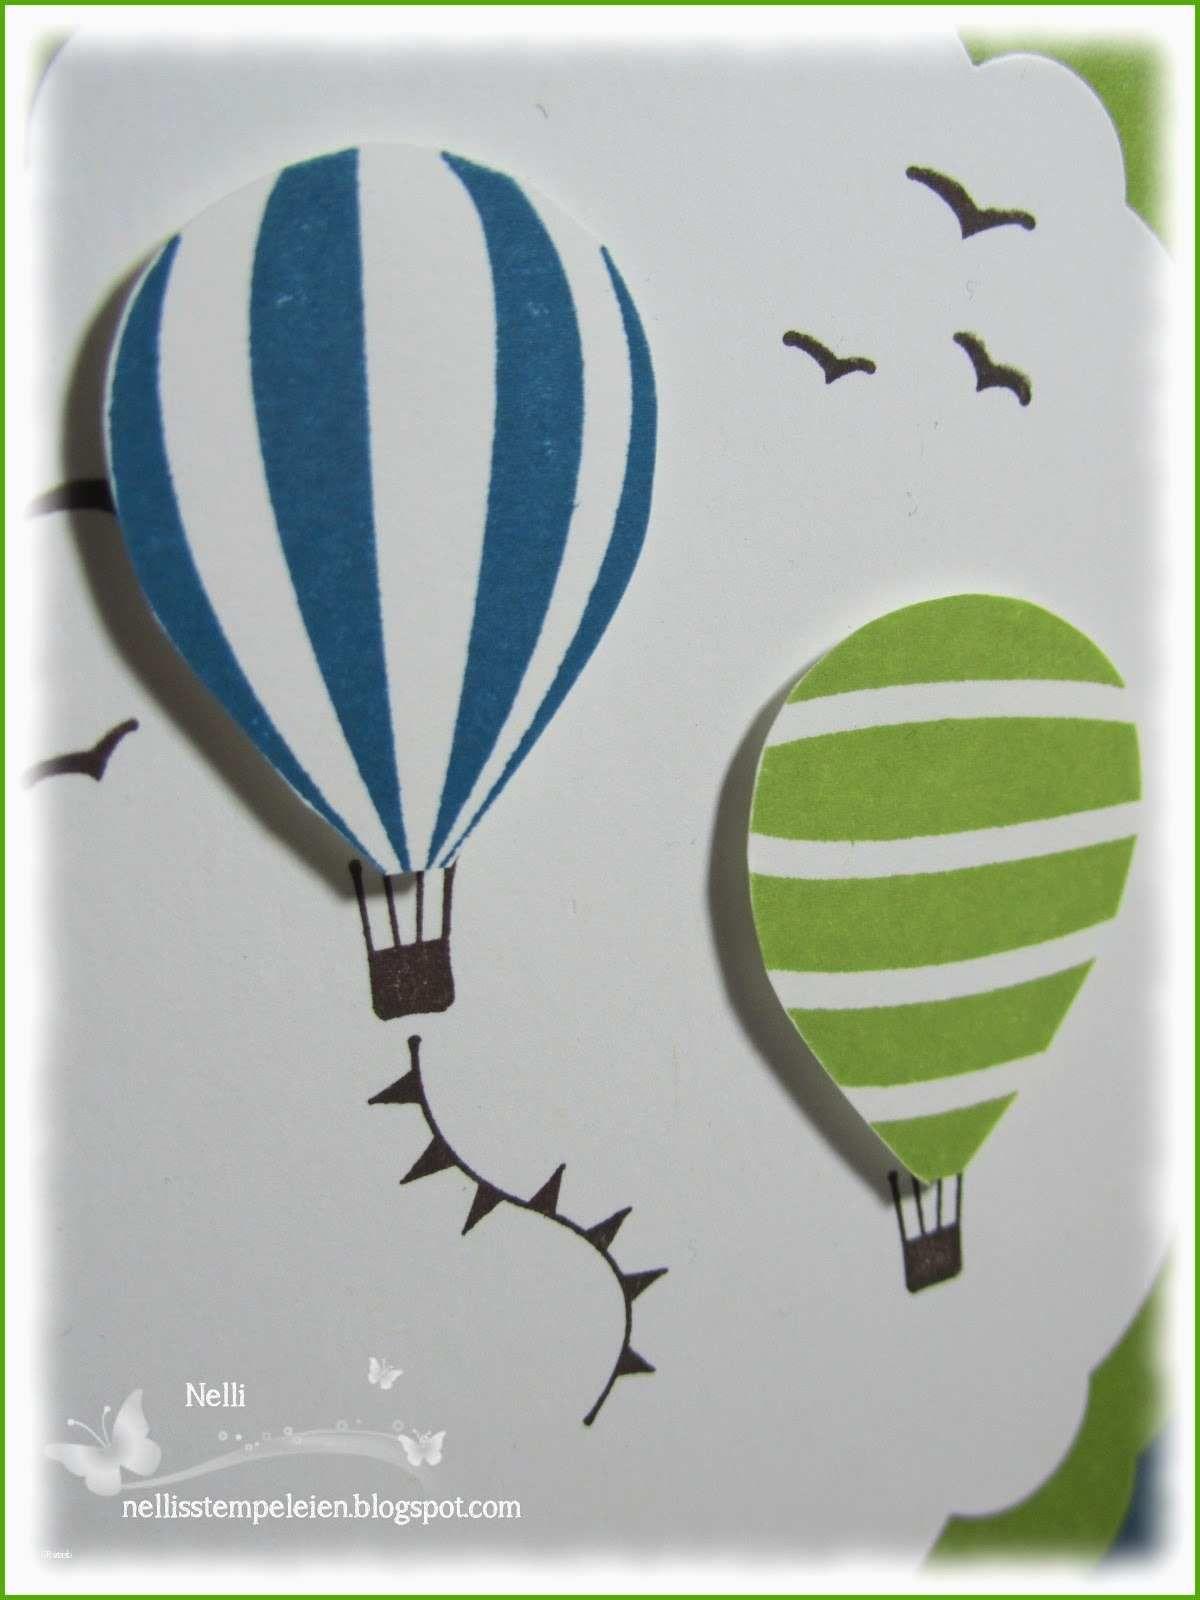 Spinning 3d Hot Air Balloon Craft For Kids 8